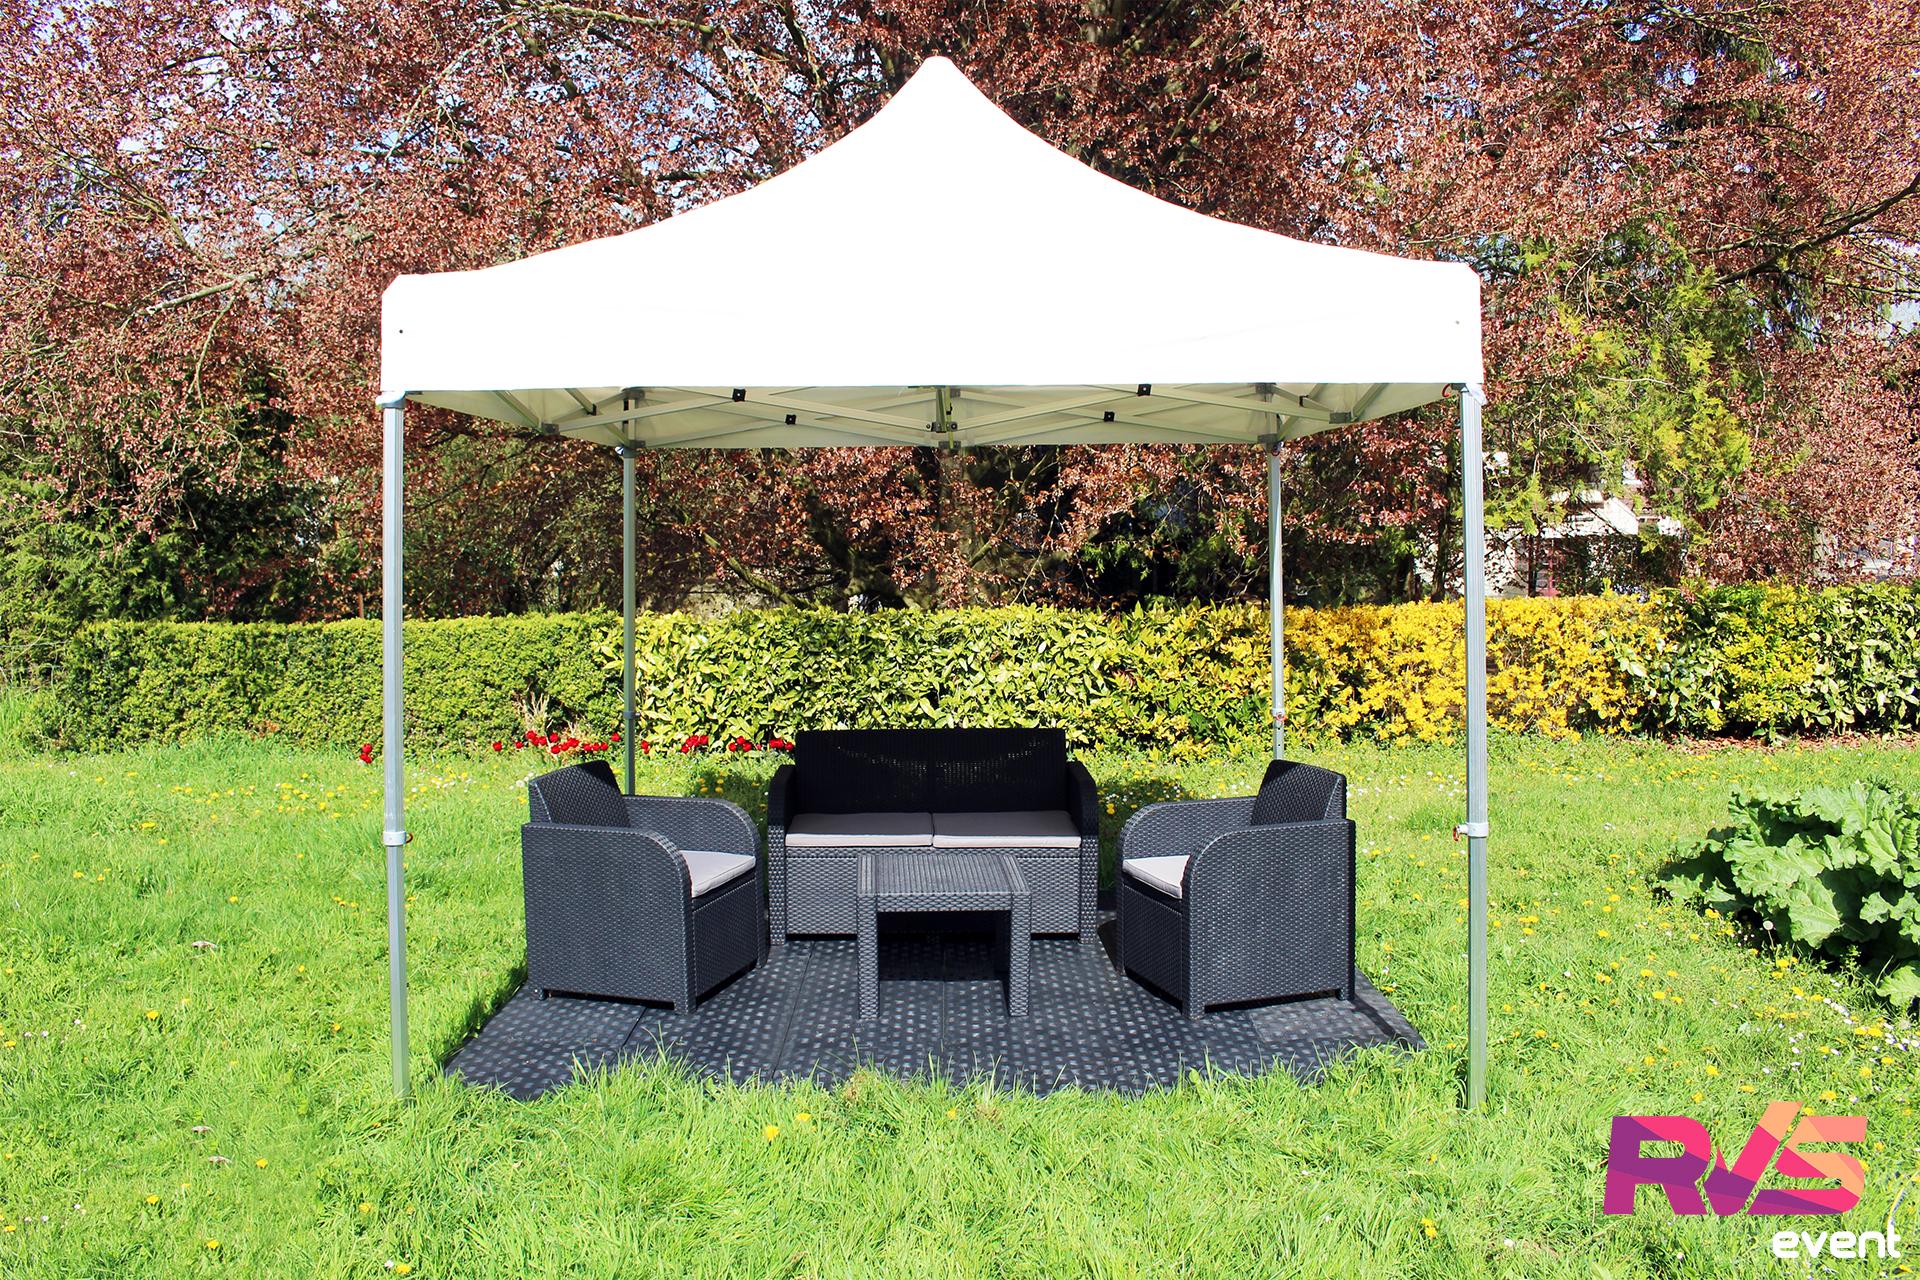 Location tentes 3x3 pliantes rvs event - Mobilier jardin kettler france mulhouse ...